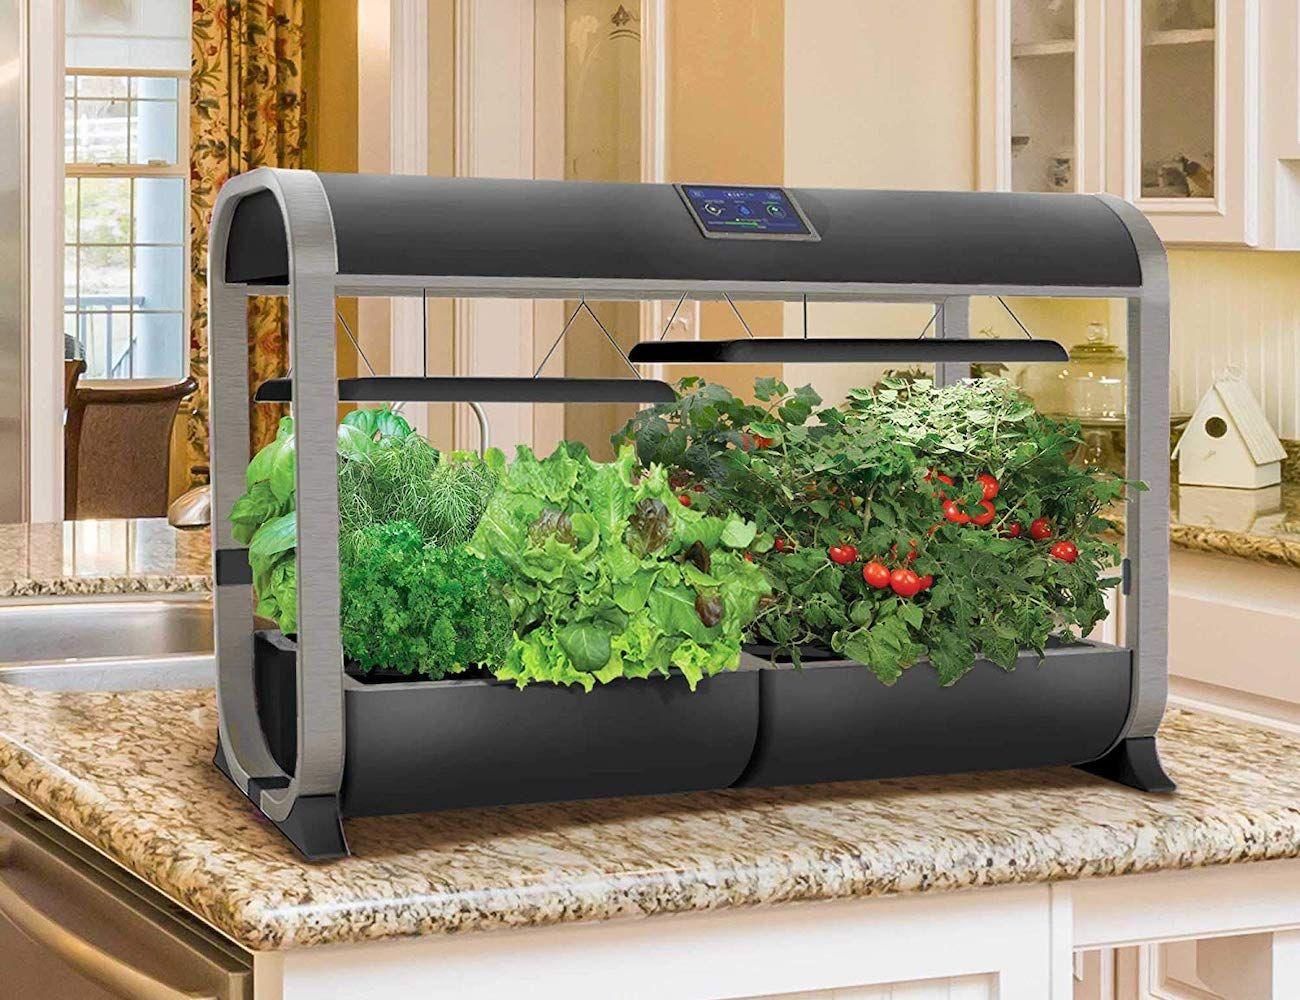 Aerogarden Farm Plus Smart Hydroponic Garden Lets You Grow 400 x 300